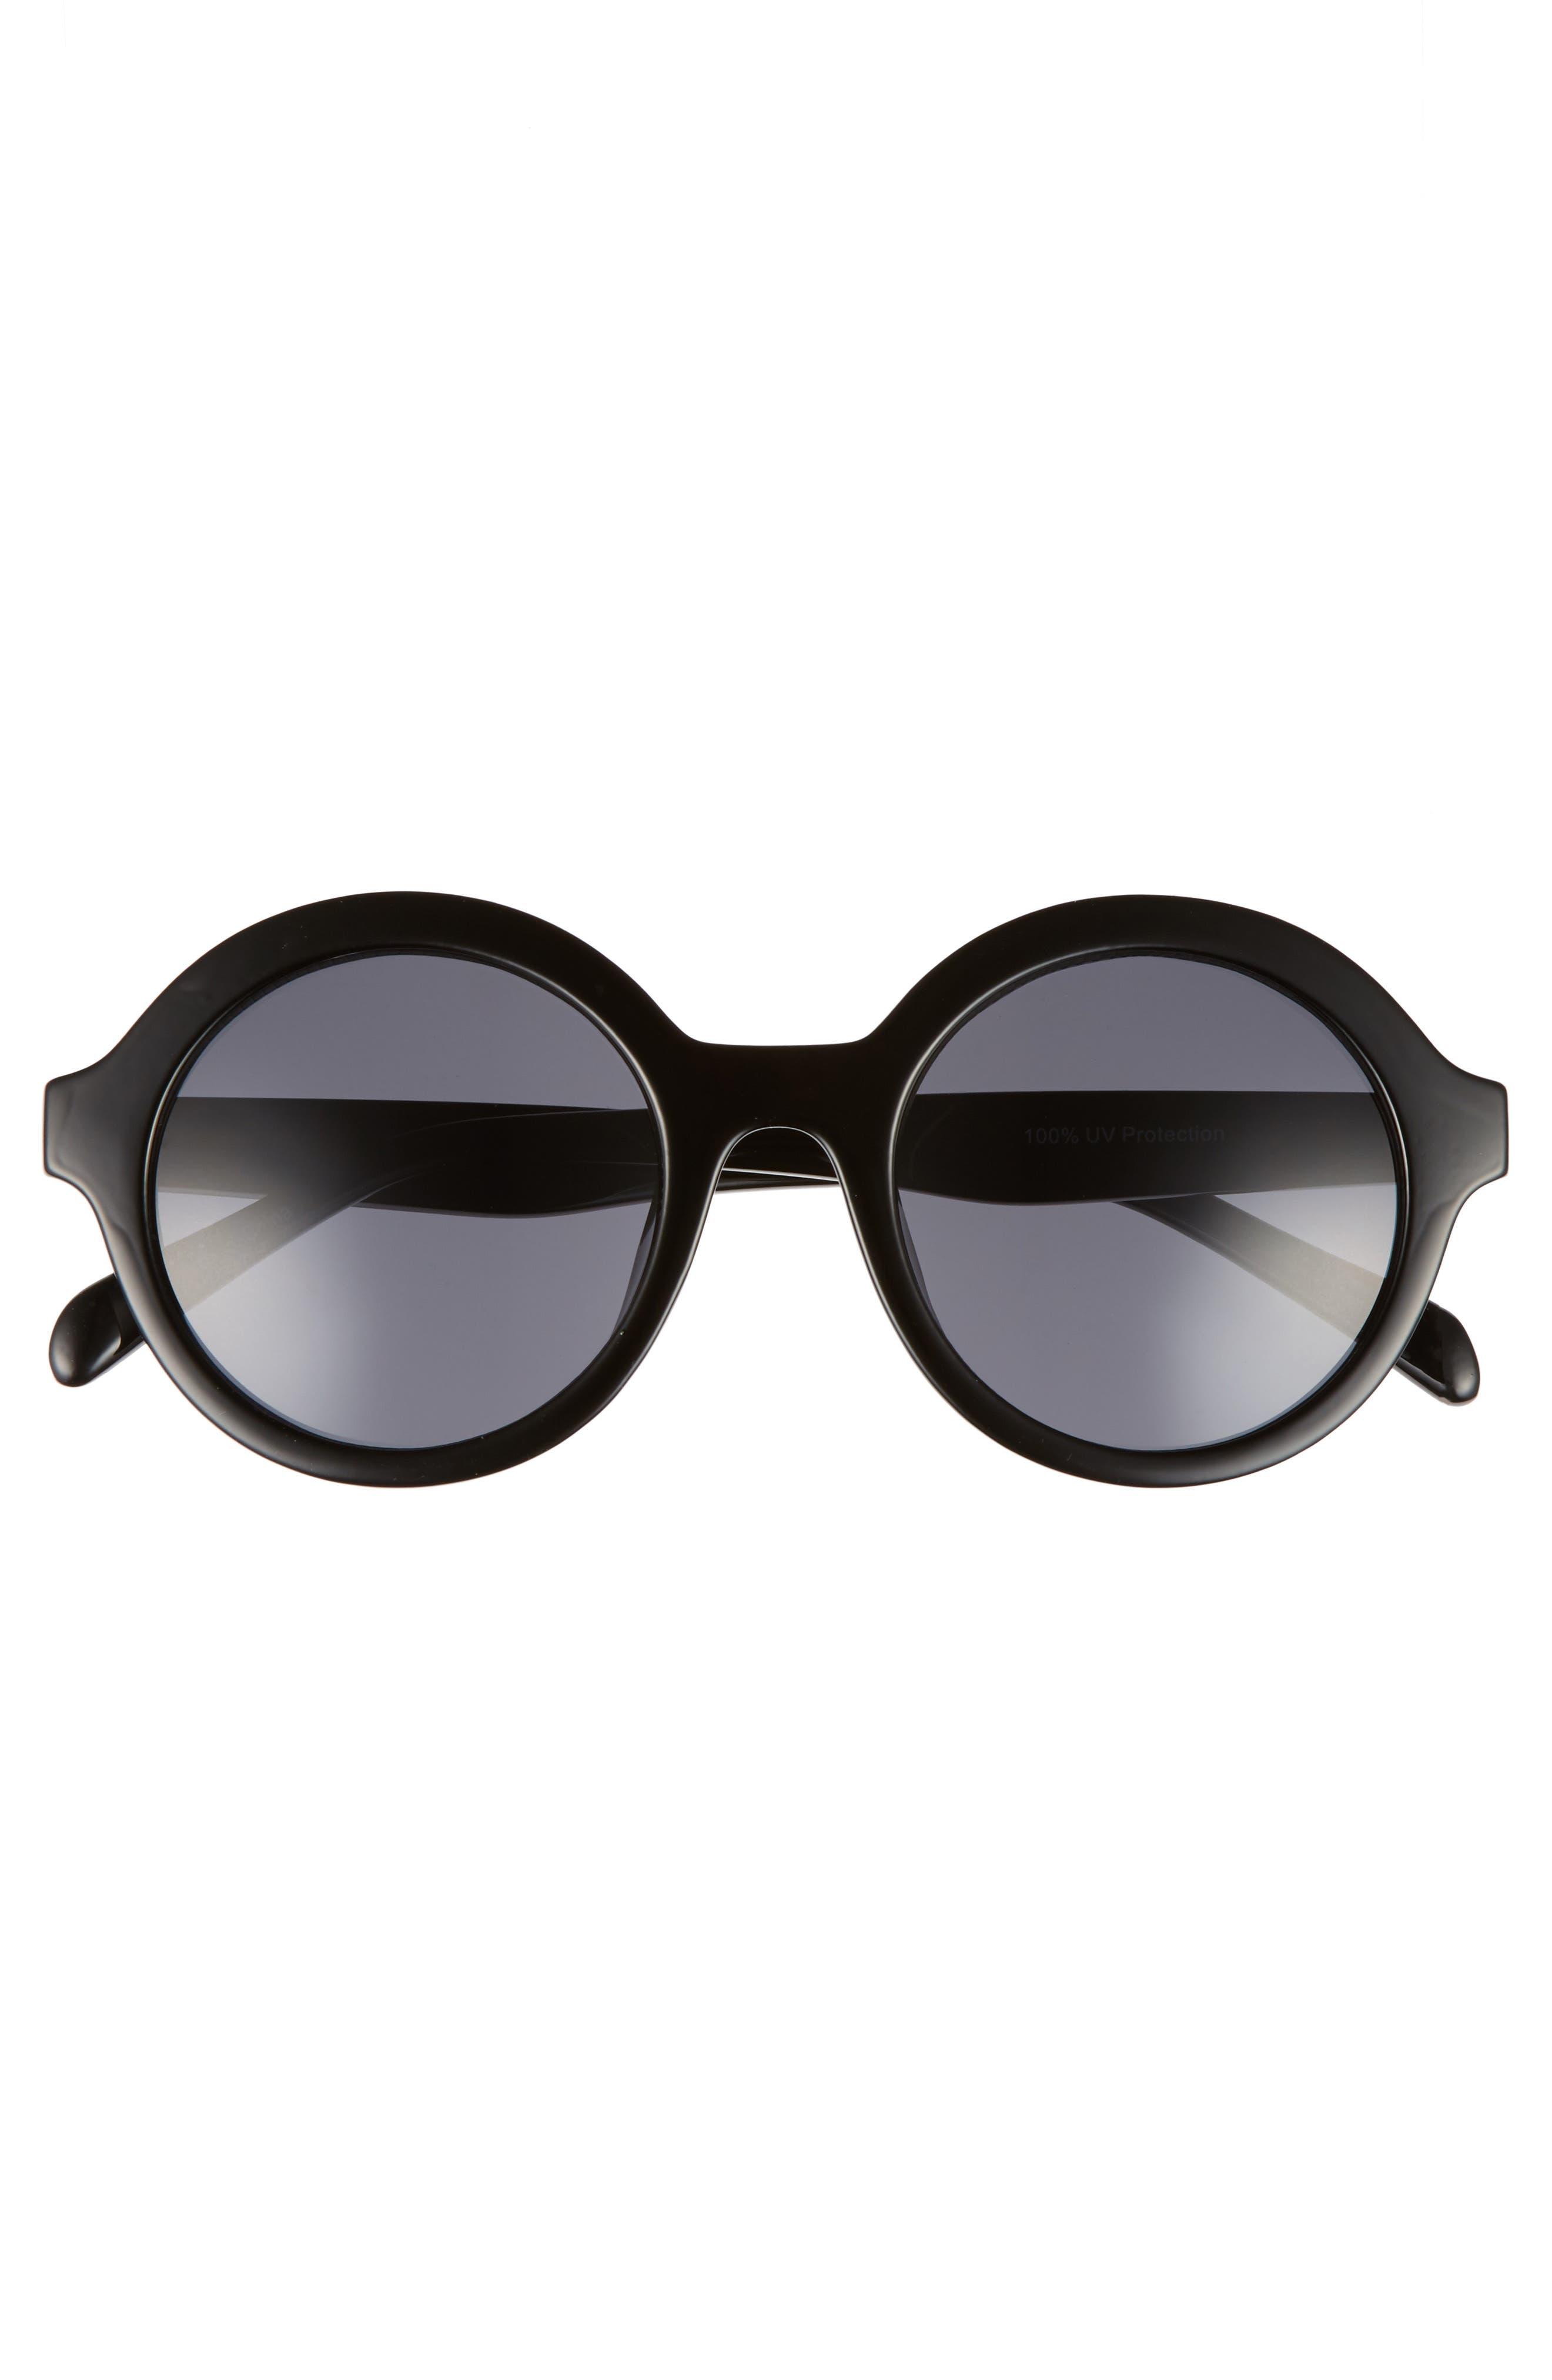 50mm Round Sunglasses,                             Alternate thumbnail 3, color,                             Black